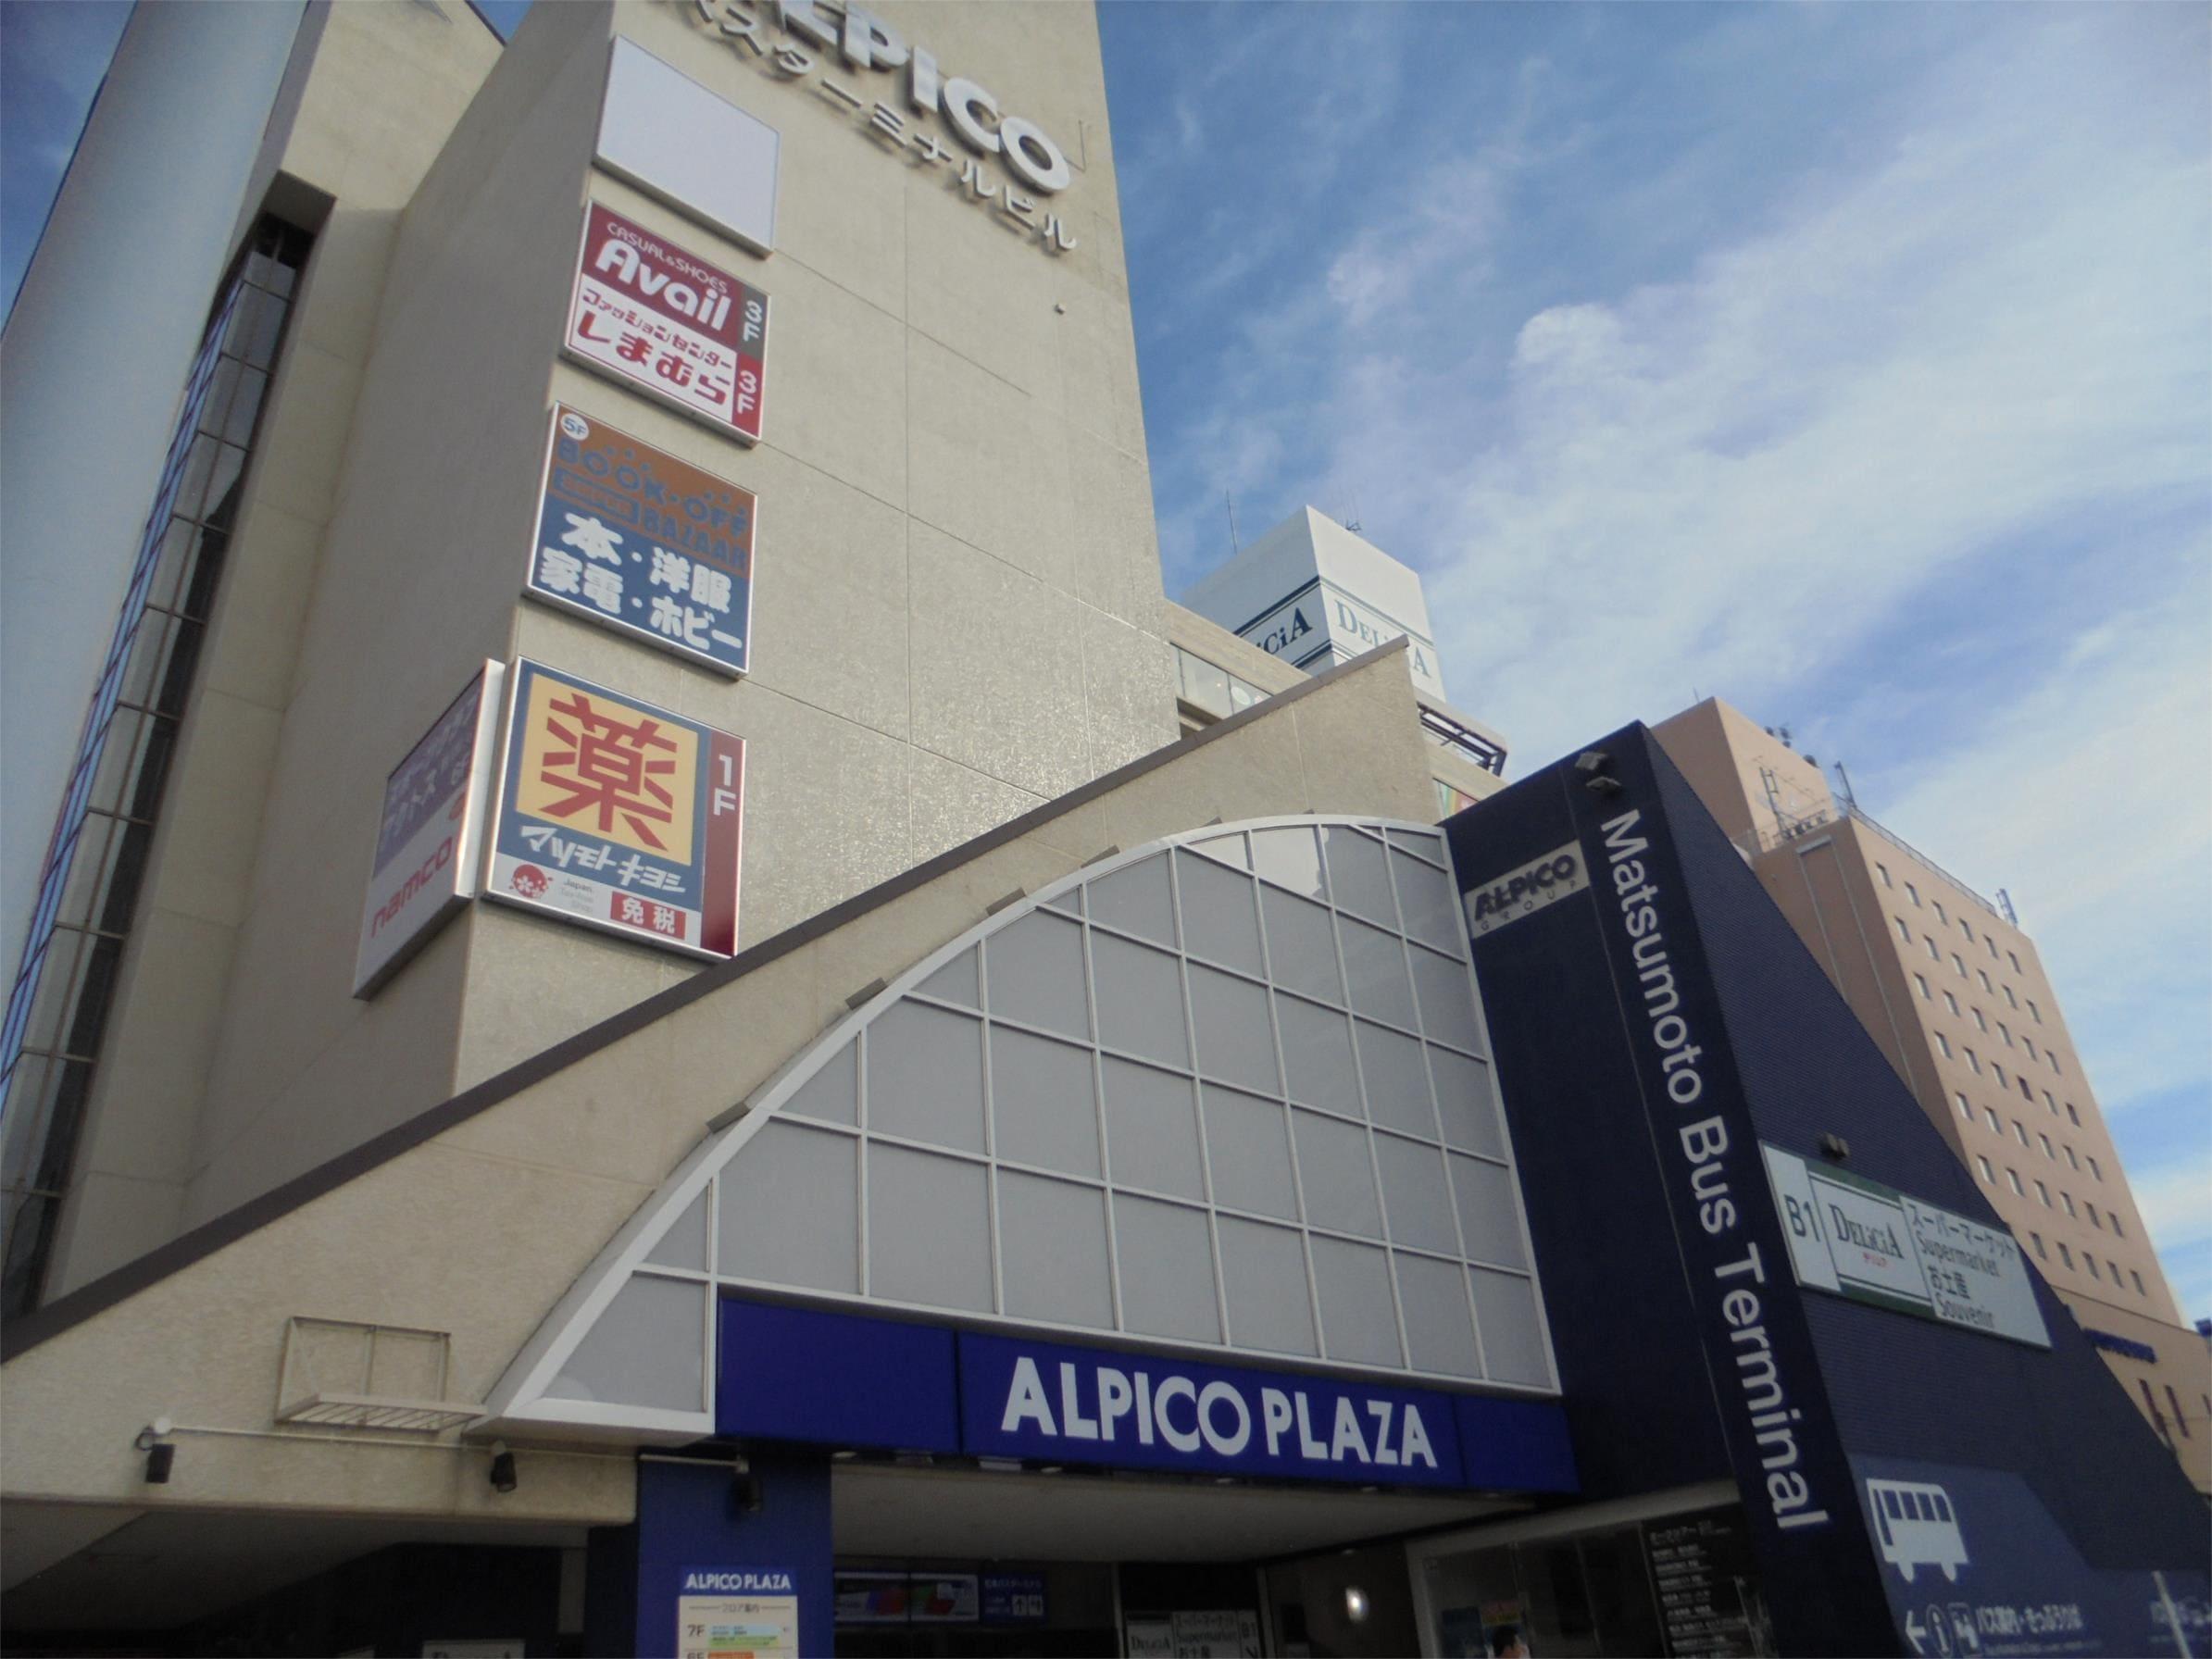 DELiCiA(デリシア) 松本駅前店(スーパー)まで386m